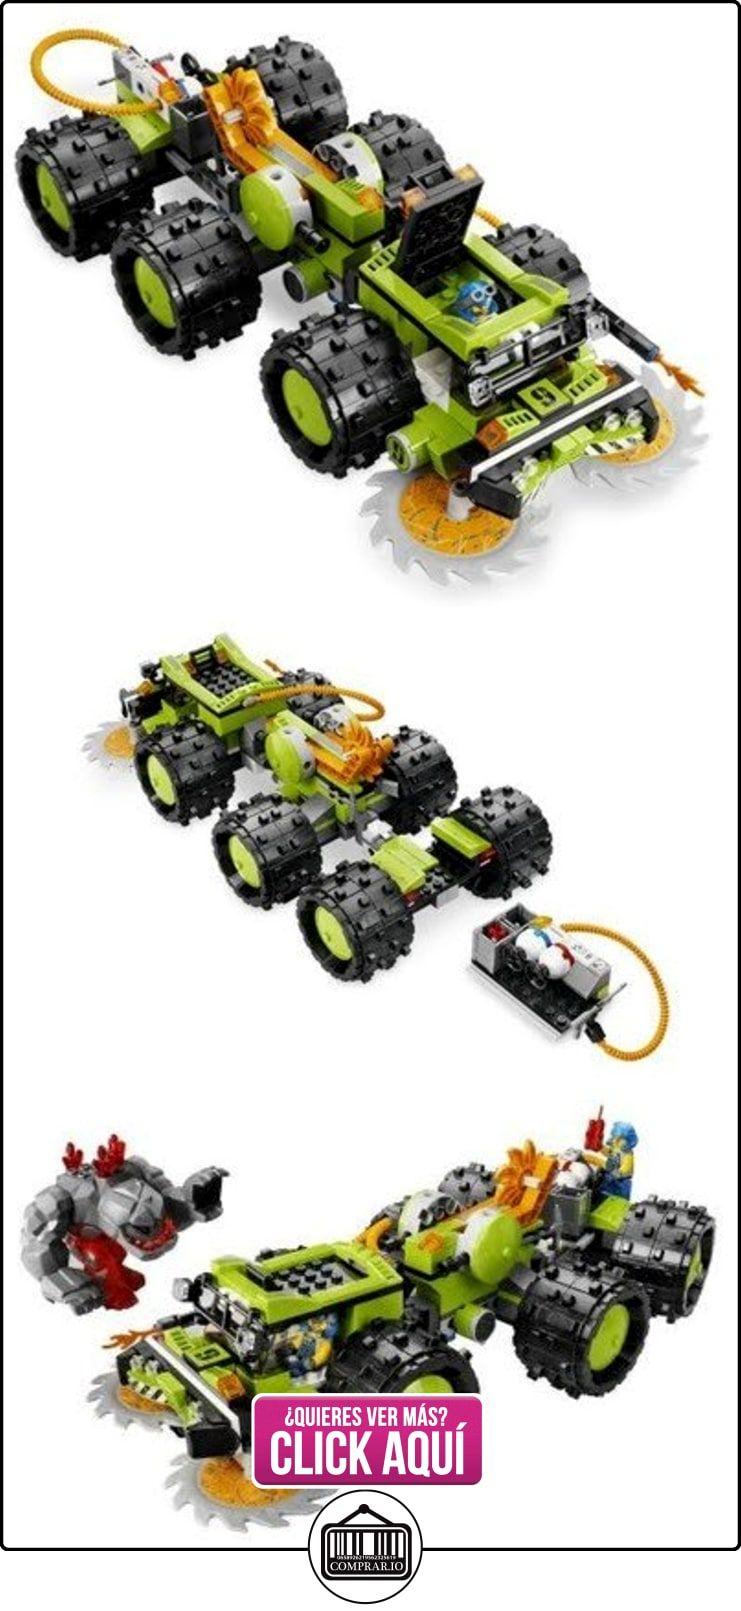 LEGO 8708 Cueva Crusher (Regopawa-Mineros Cueva Crusher) (jap?n importaci?n)  ✿ Lego - el surtido más amplio ✿ ▬► Ver oferta: https://comprar.io/goto/B001URW7J4